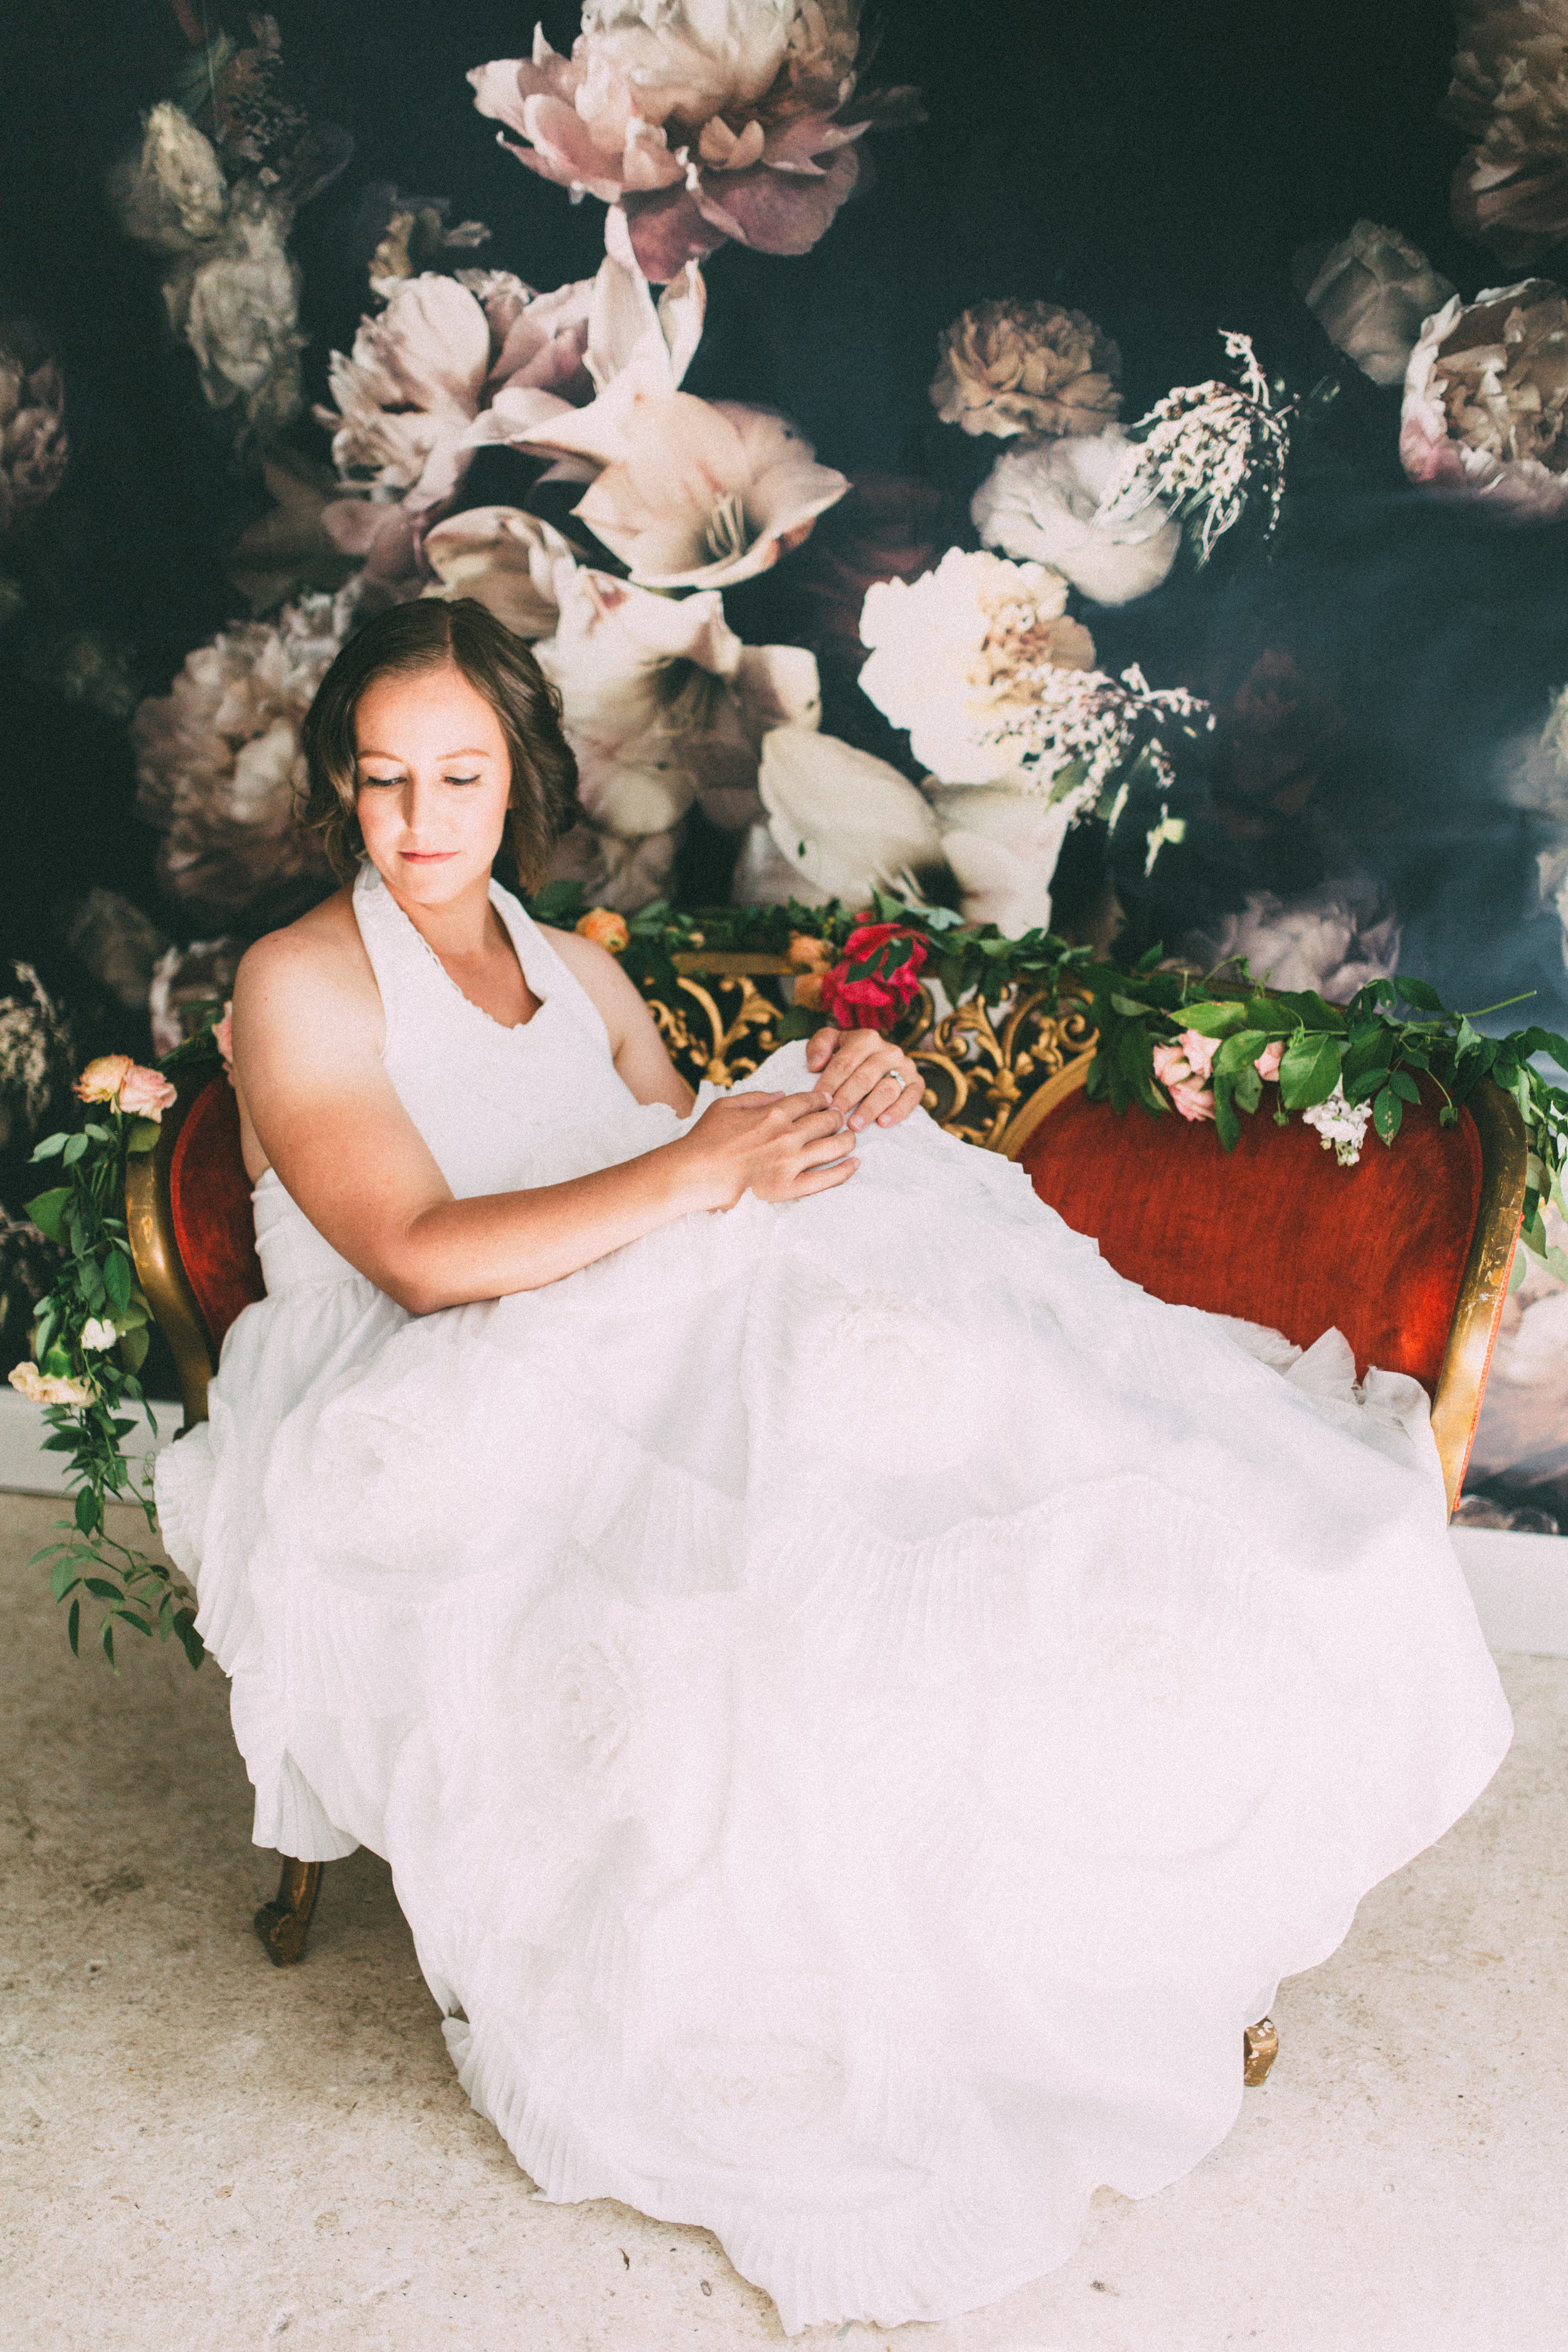 Portrait of a Woman-Portrait of a Woman-0038.jpg